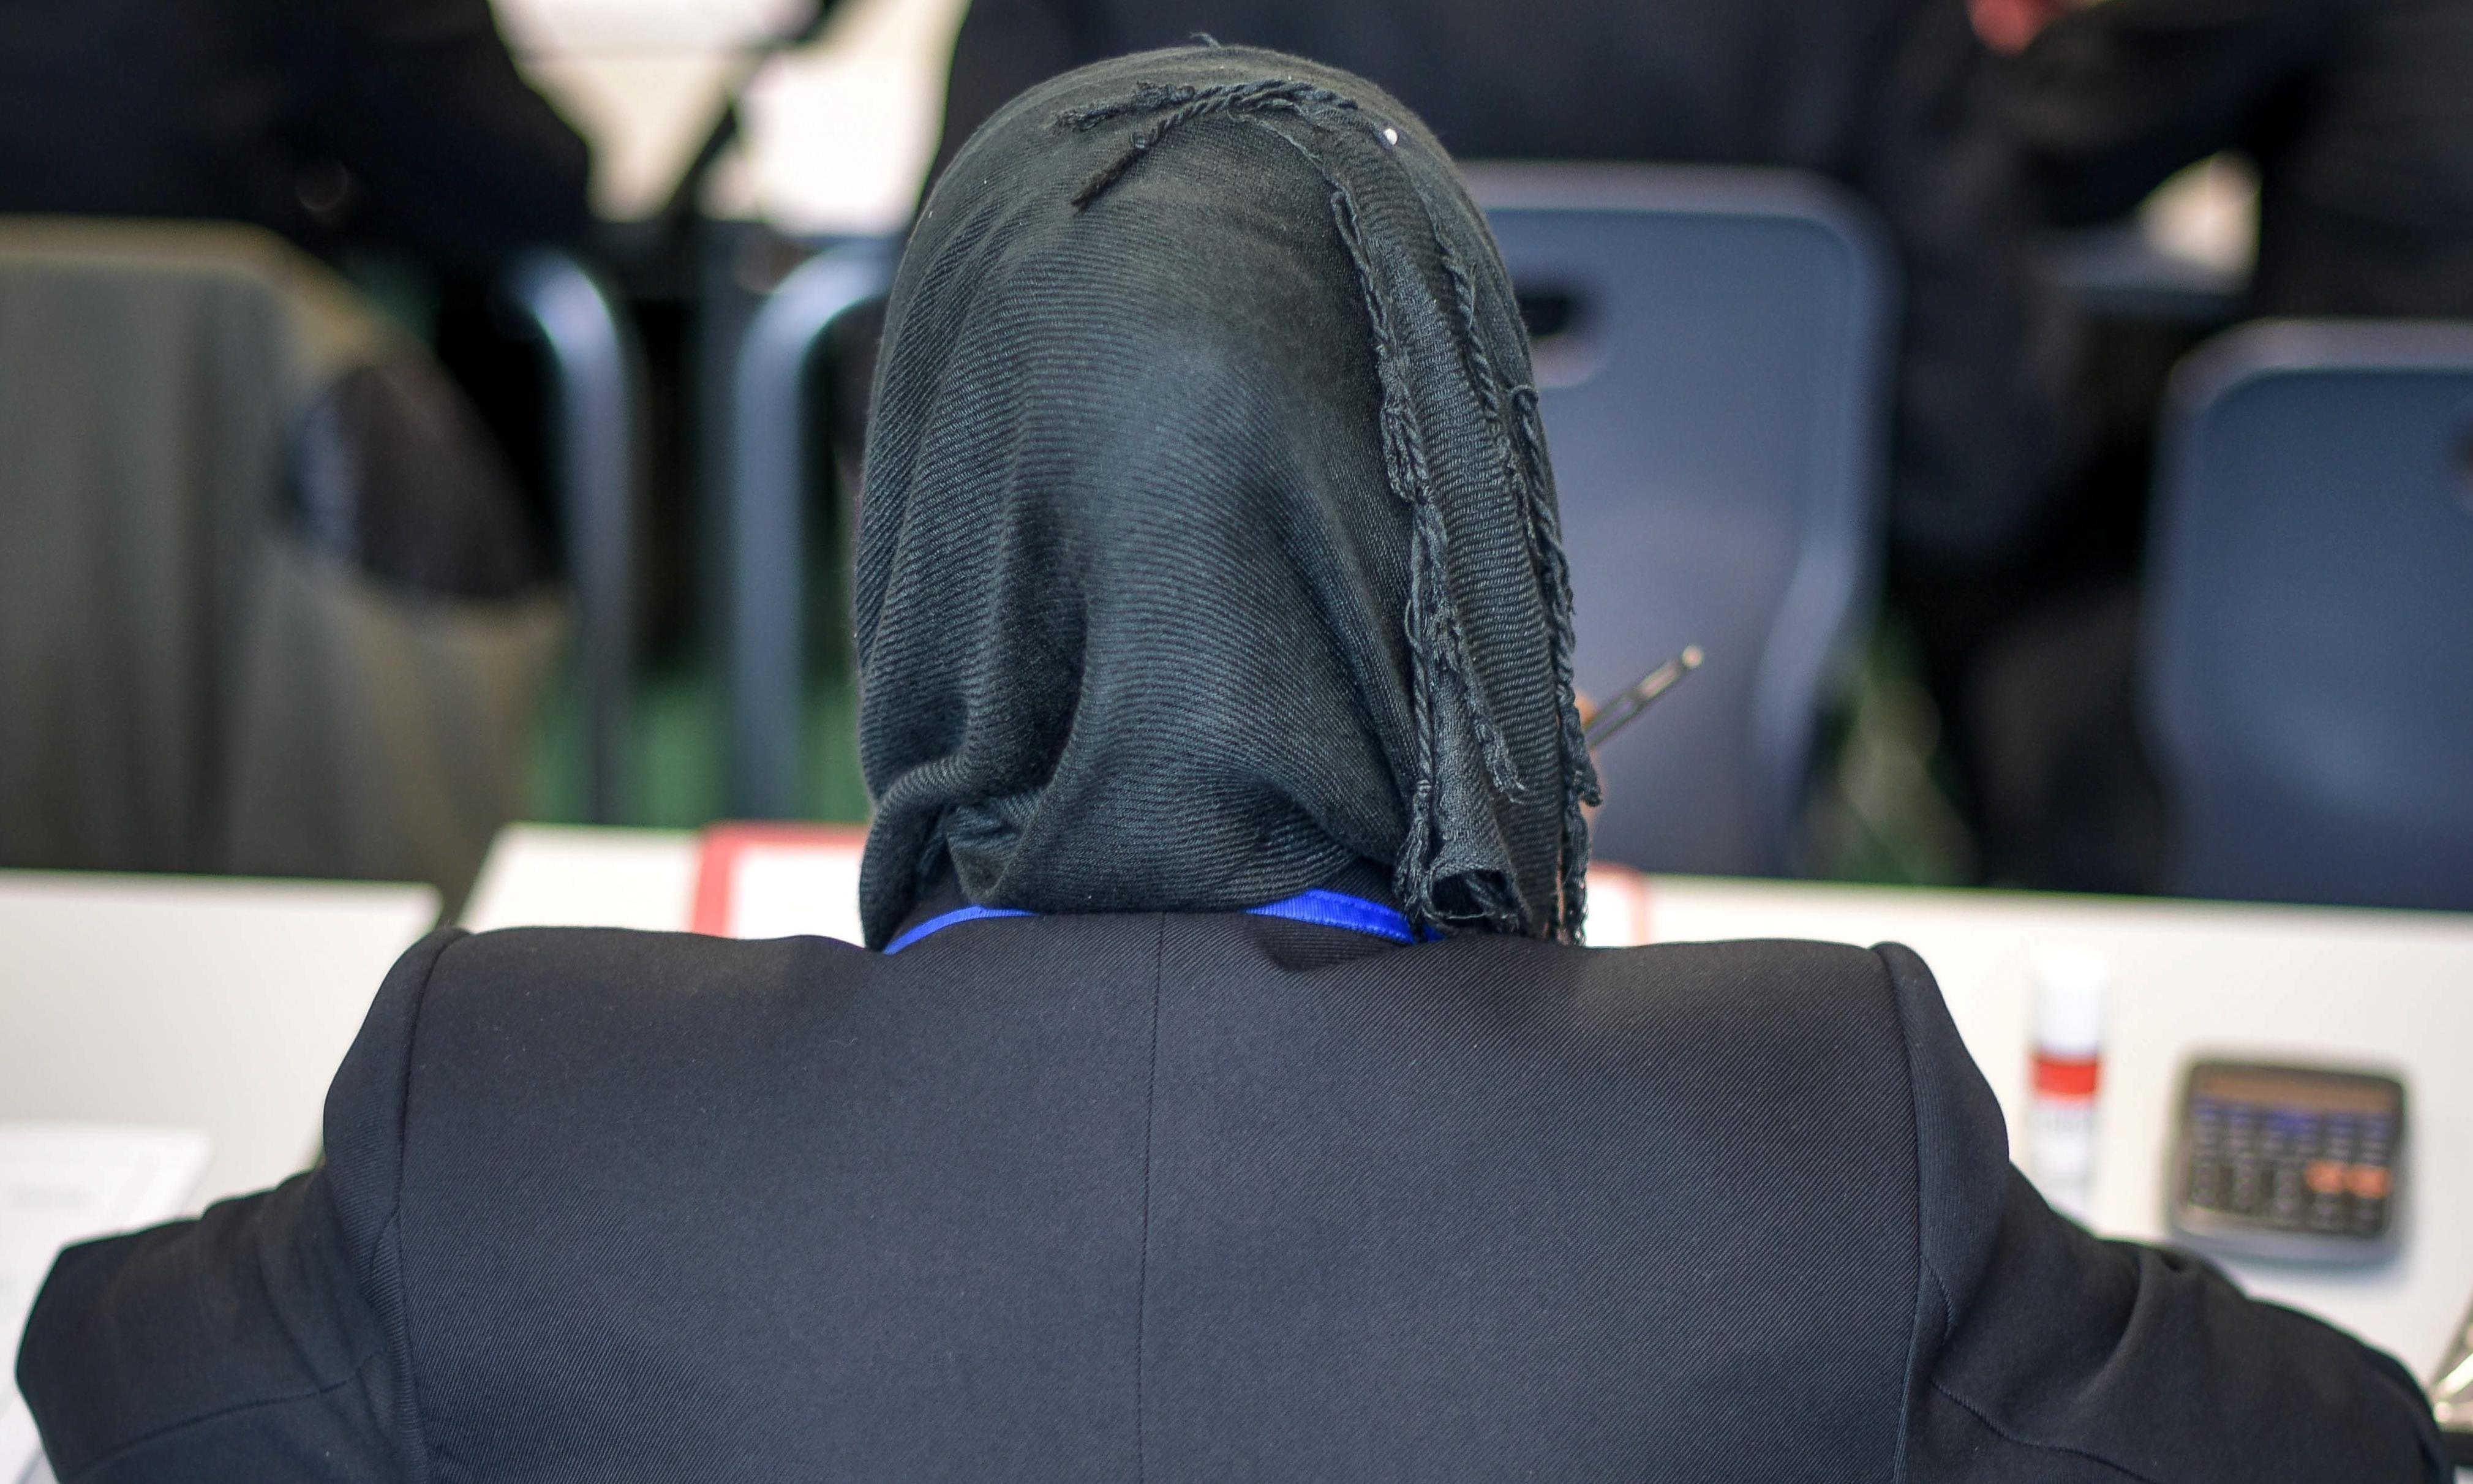 Quebec law banning hijab at work creates 'politics of fear', say critics